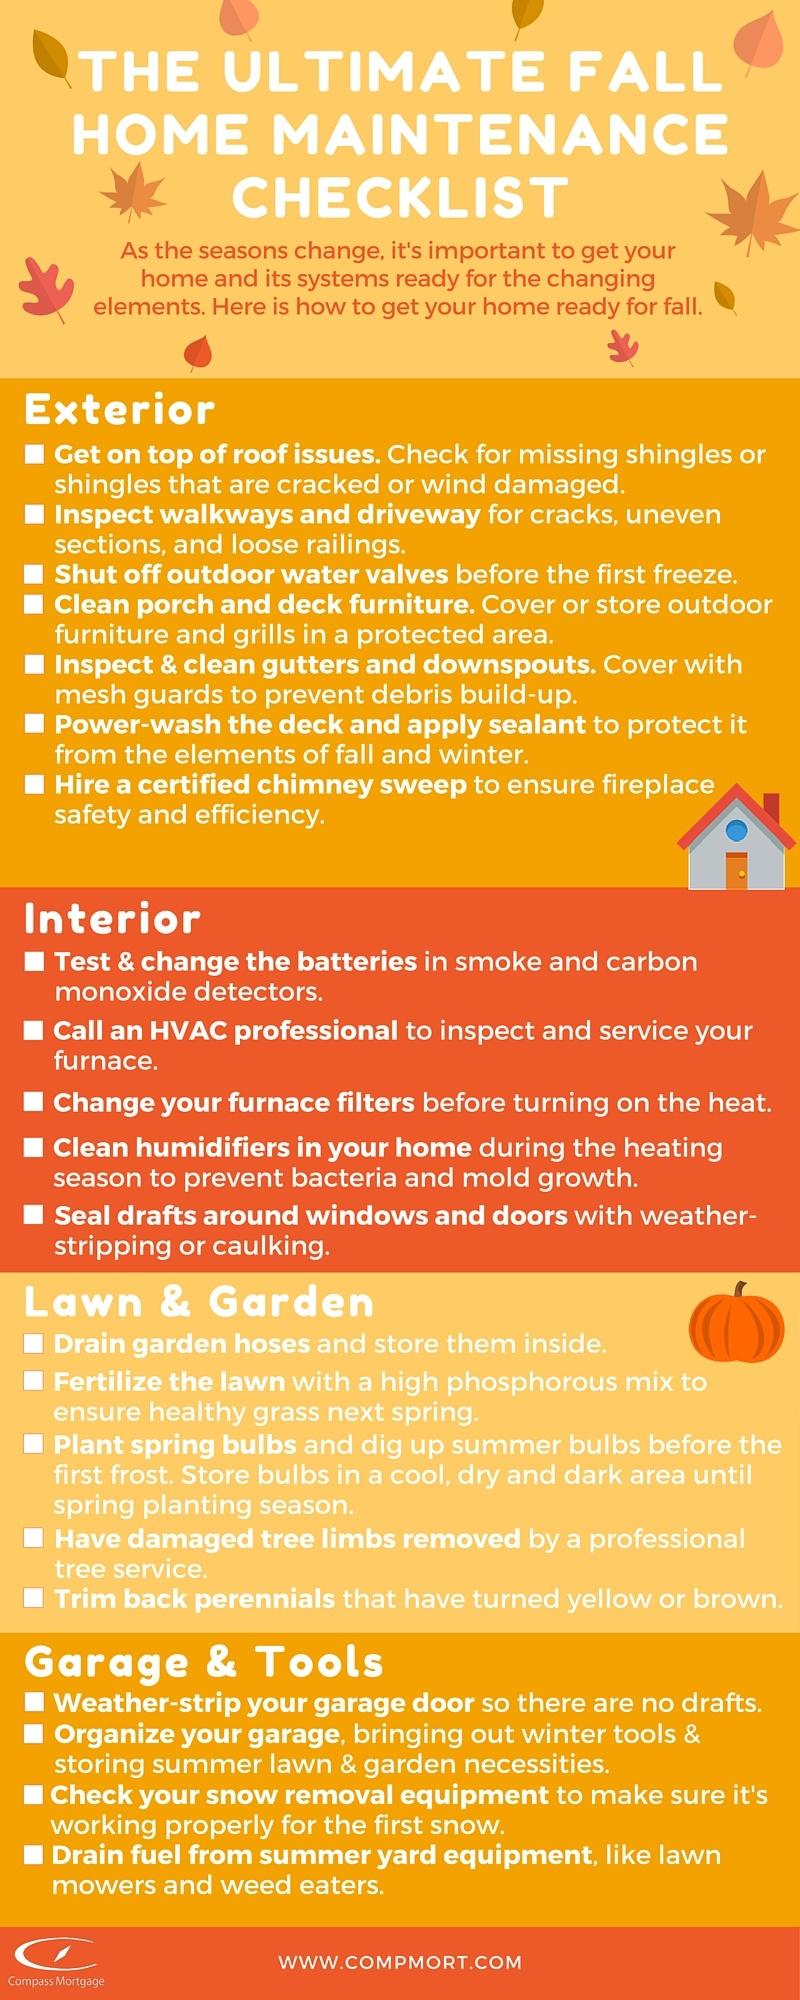 Ultimate Fall Home Maintenance Checklist